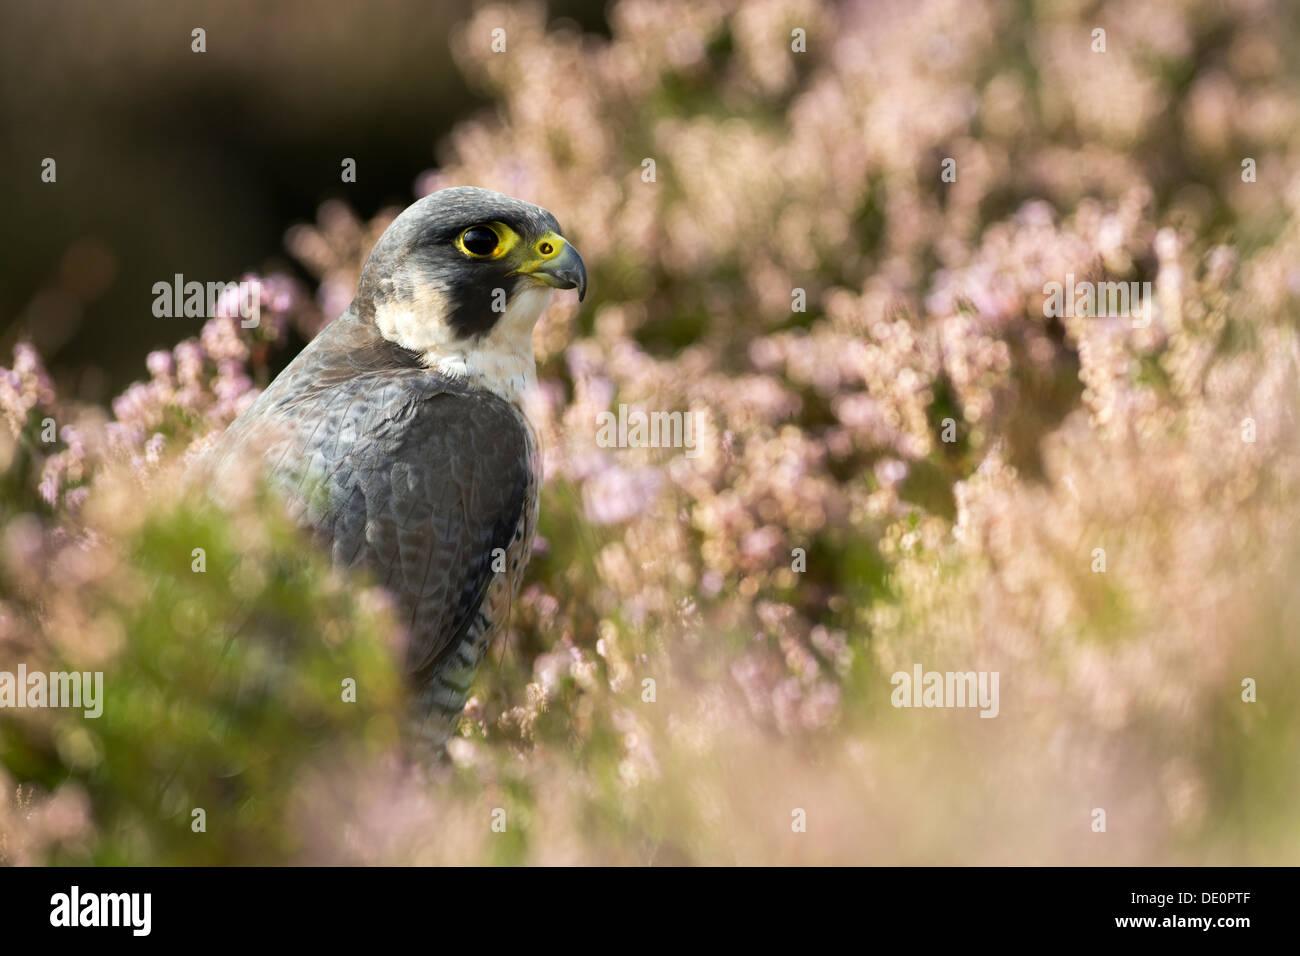 Peregrine Falcon, Falco peregrinus, resting in heather on moorland, Yorkshire, UK. Captive bird. - Stock Image